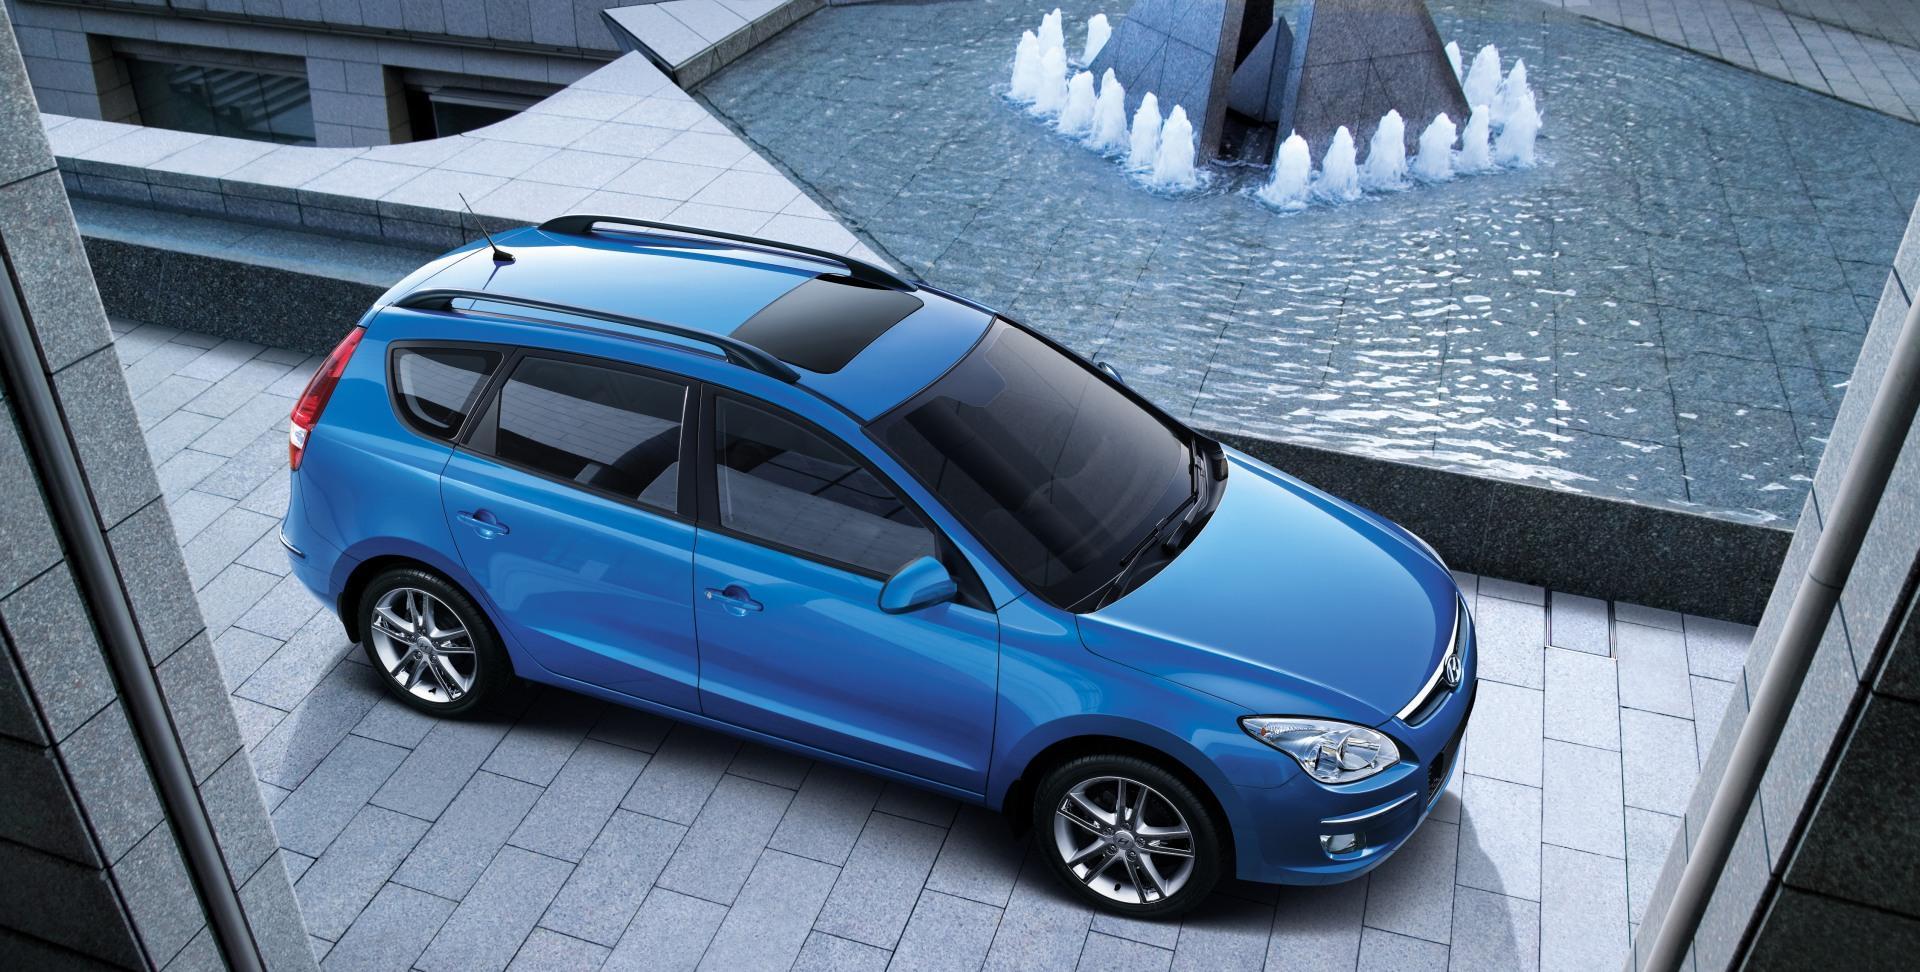 2010 Hyundai Elantra Touring News And Information